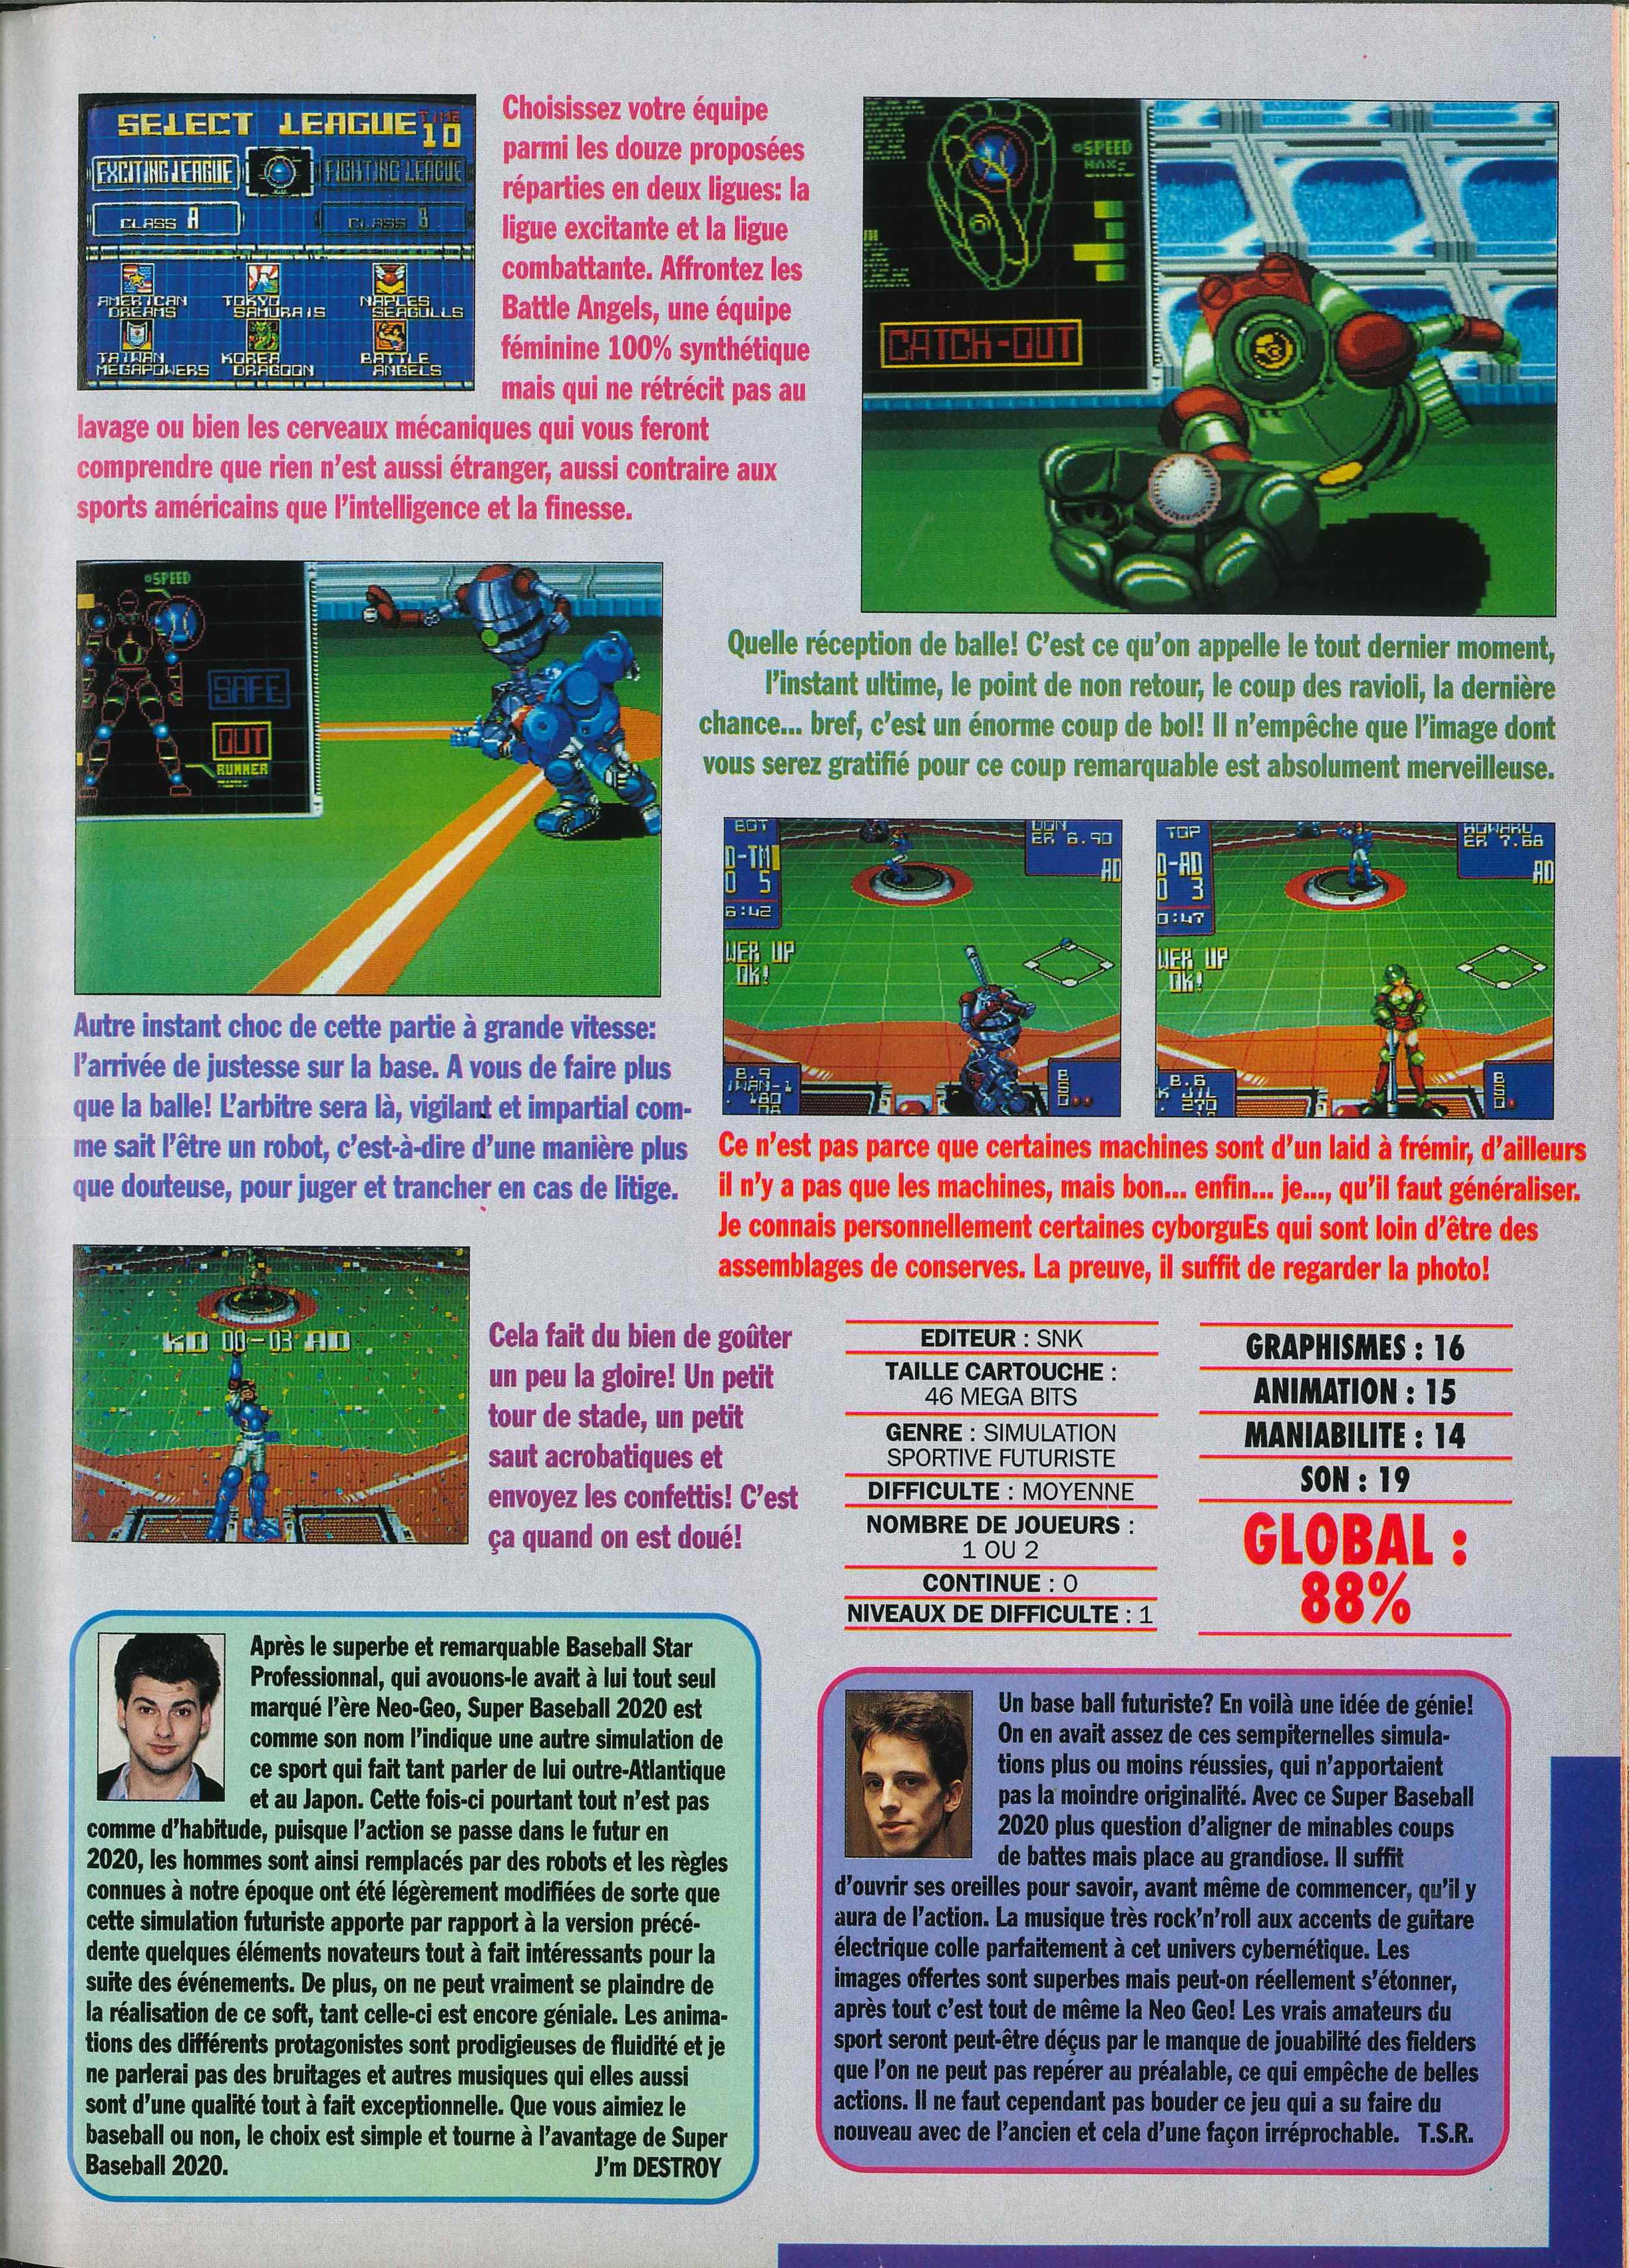 La NEO•GEO dans la presse - Volume II (1991) Joypad%20003%20-%20Page%20127%20%281991-12%29